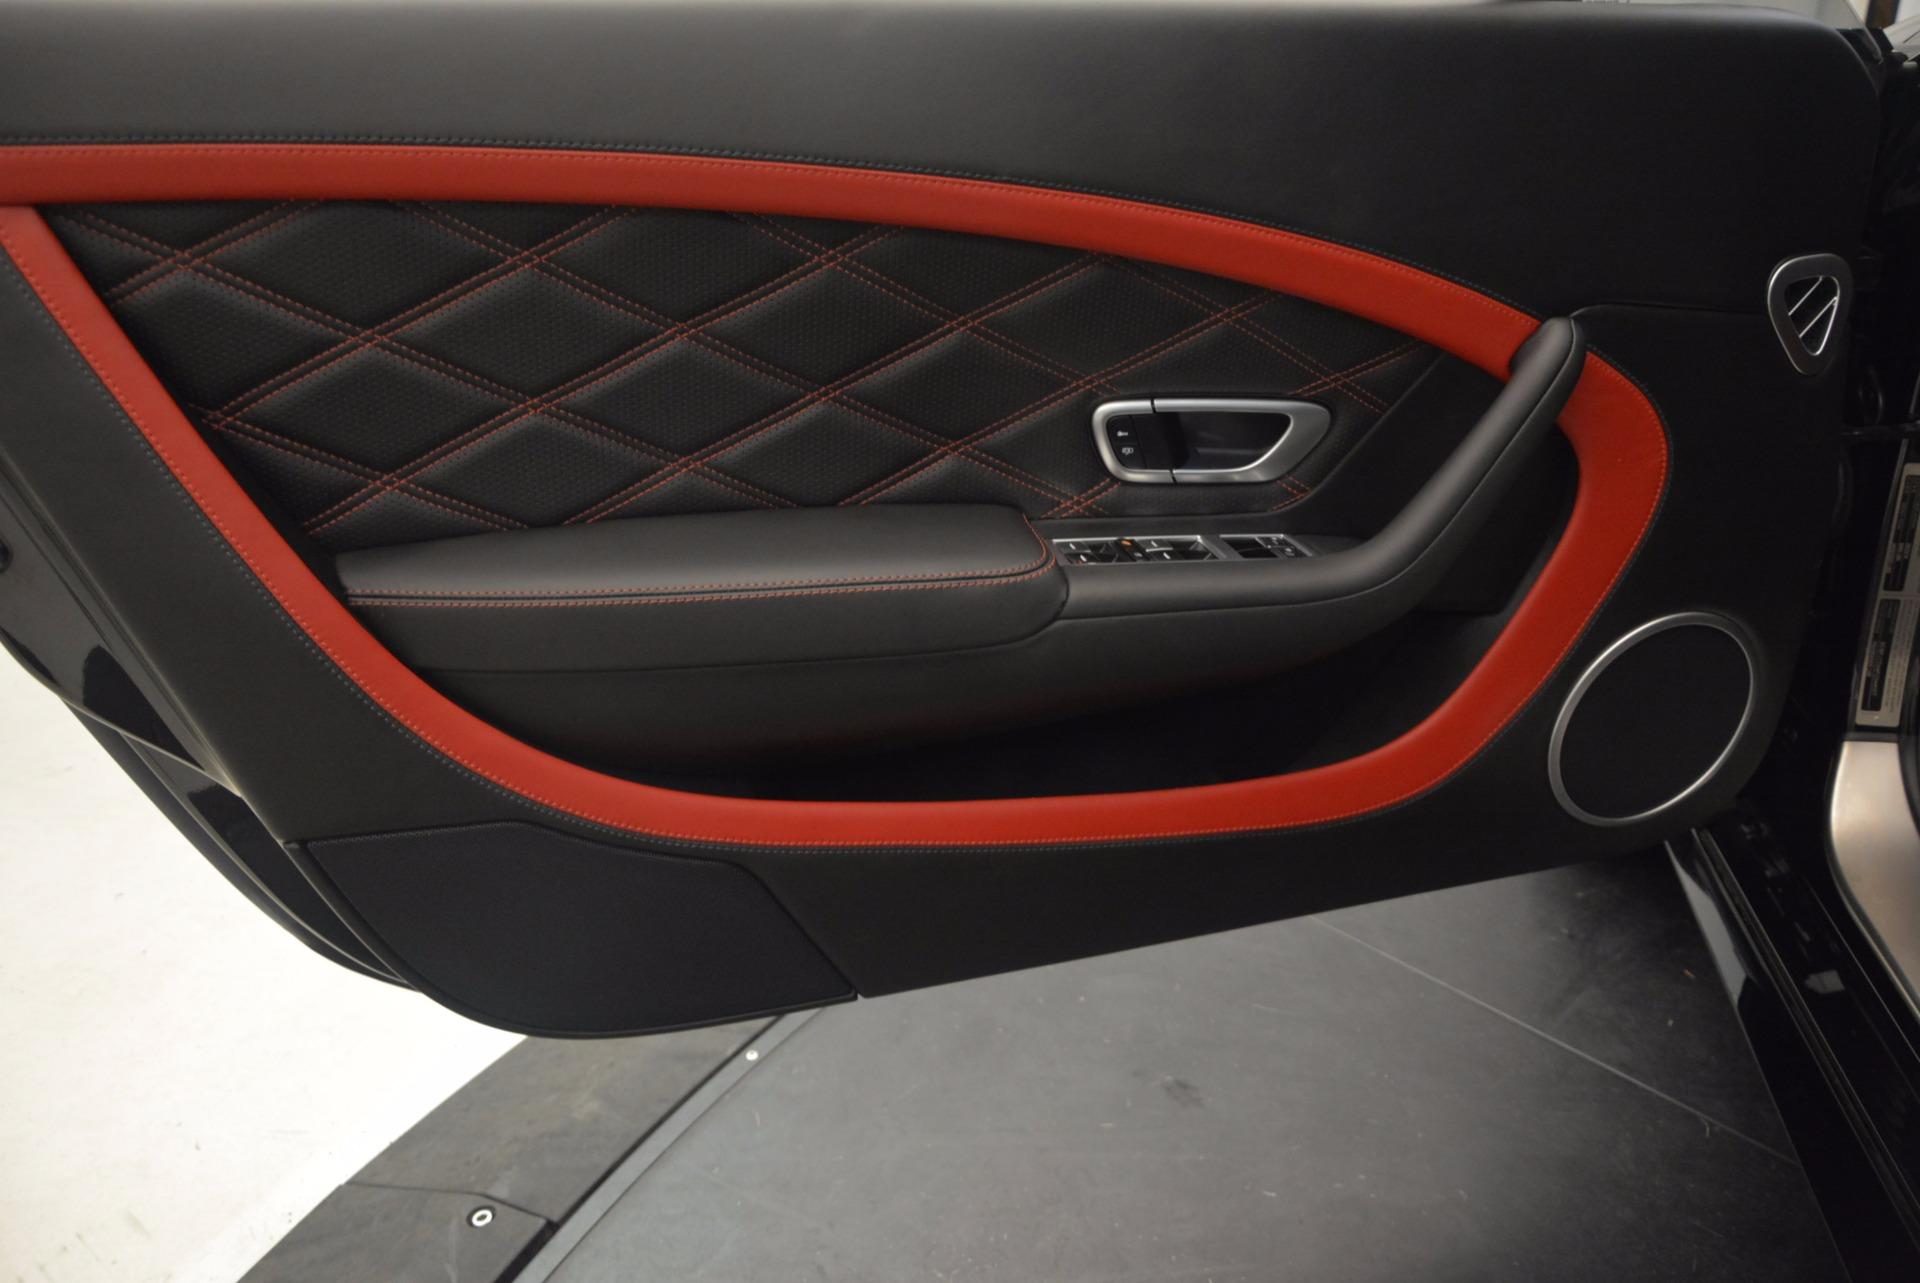 Used 2015 Bentley Continental GT Speed For Sale In Westport, CT 1646_p21